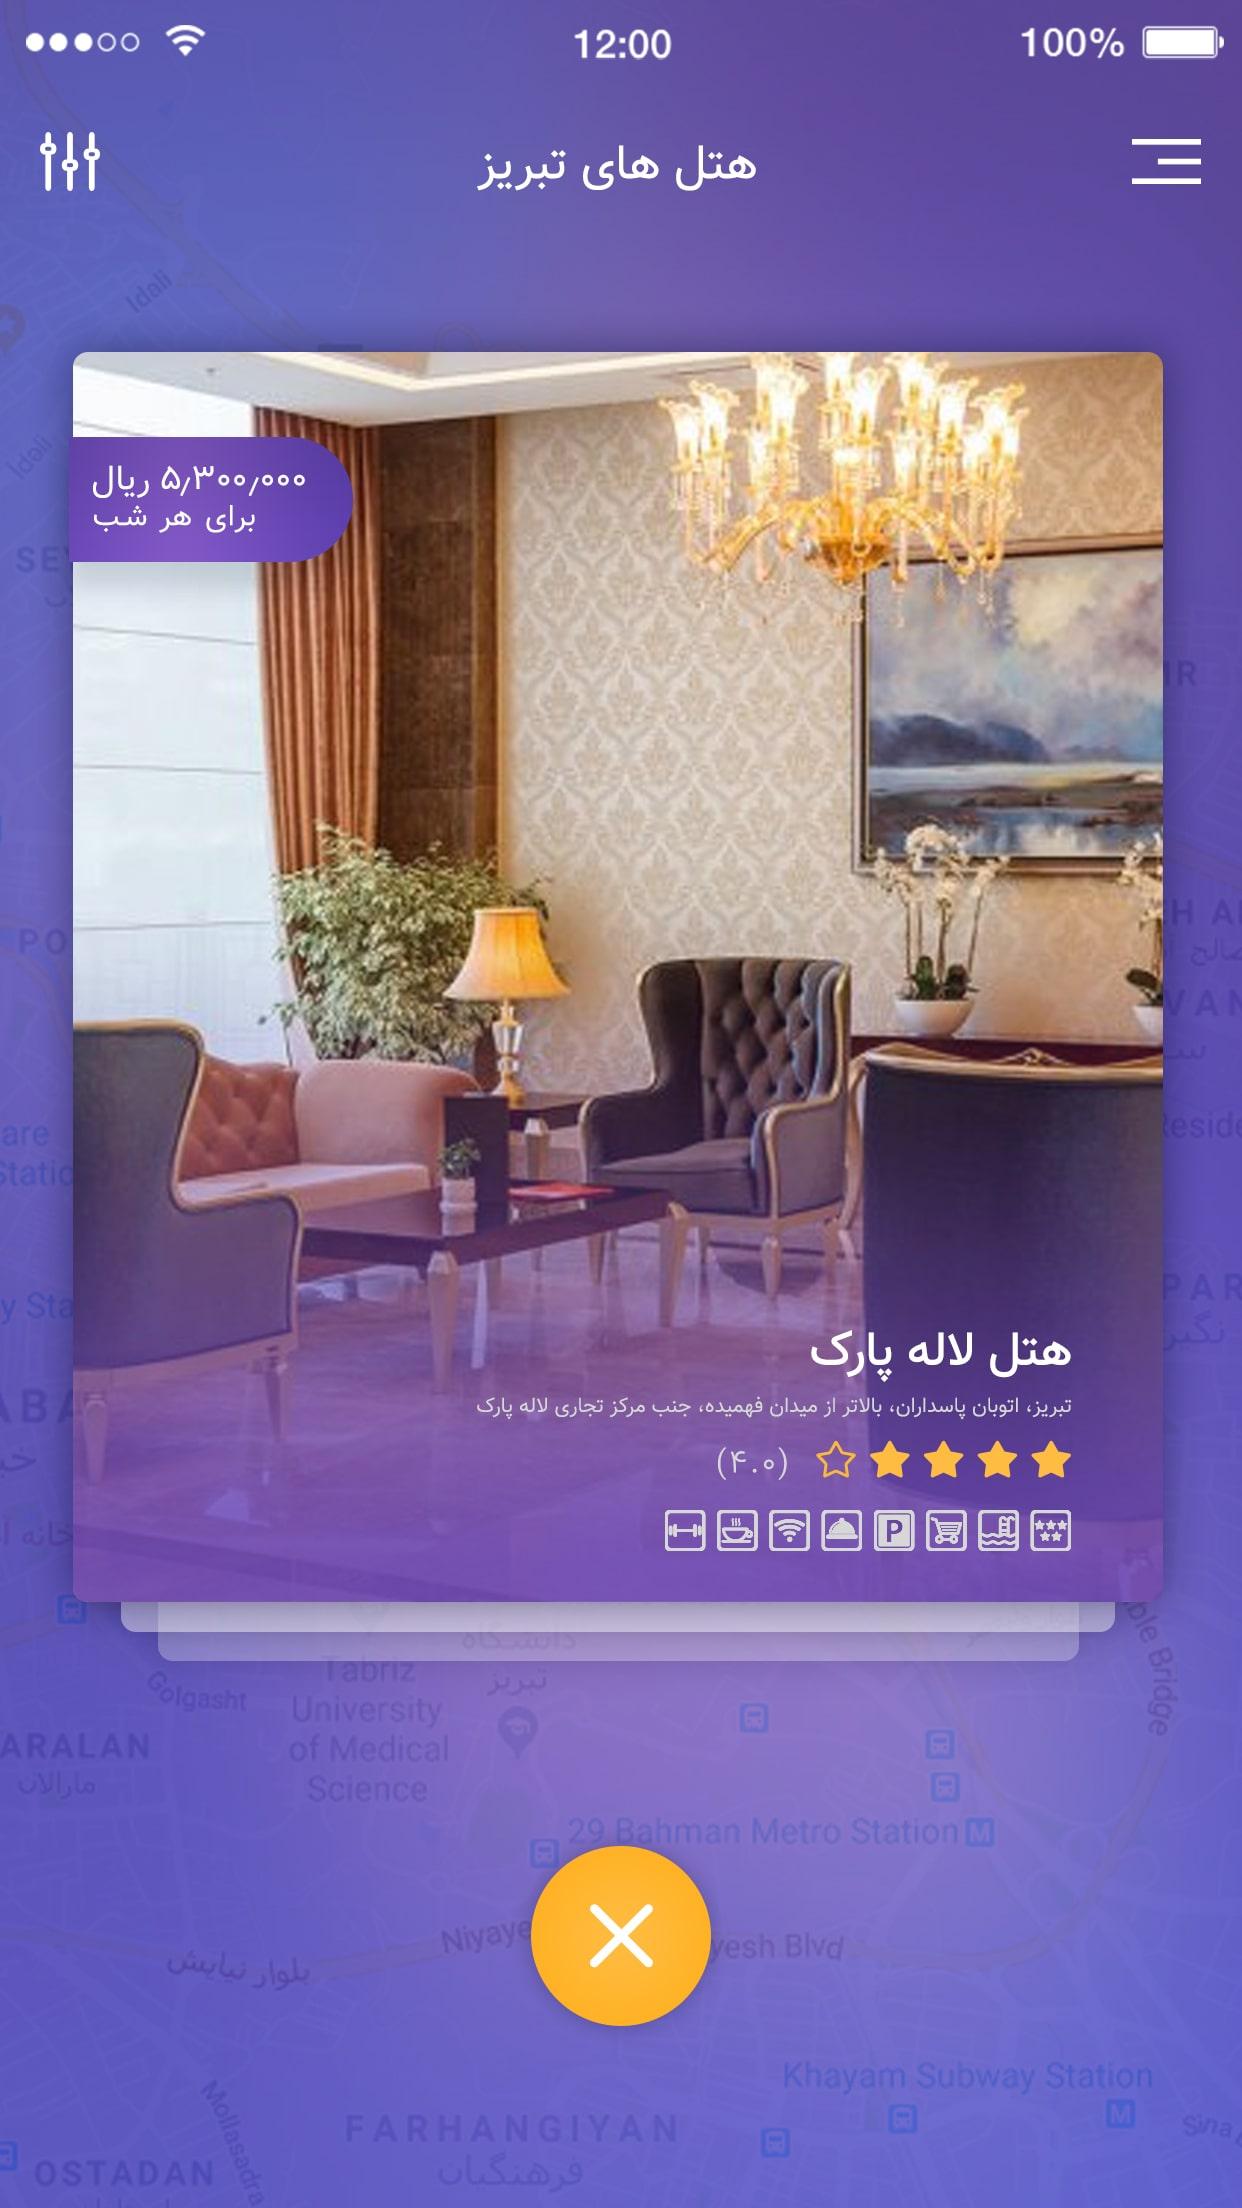 قالب psd اپلیکیشن رزرو هتل HotelYar